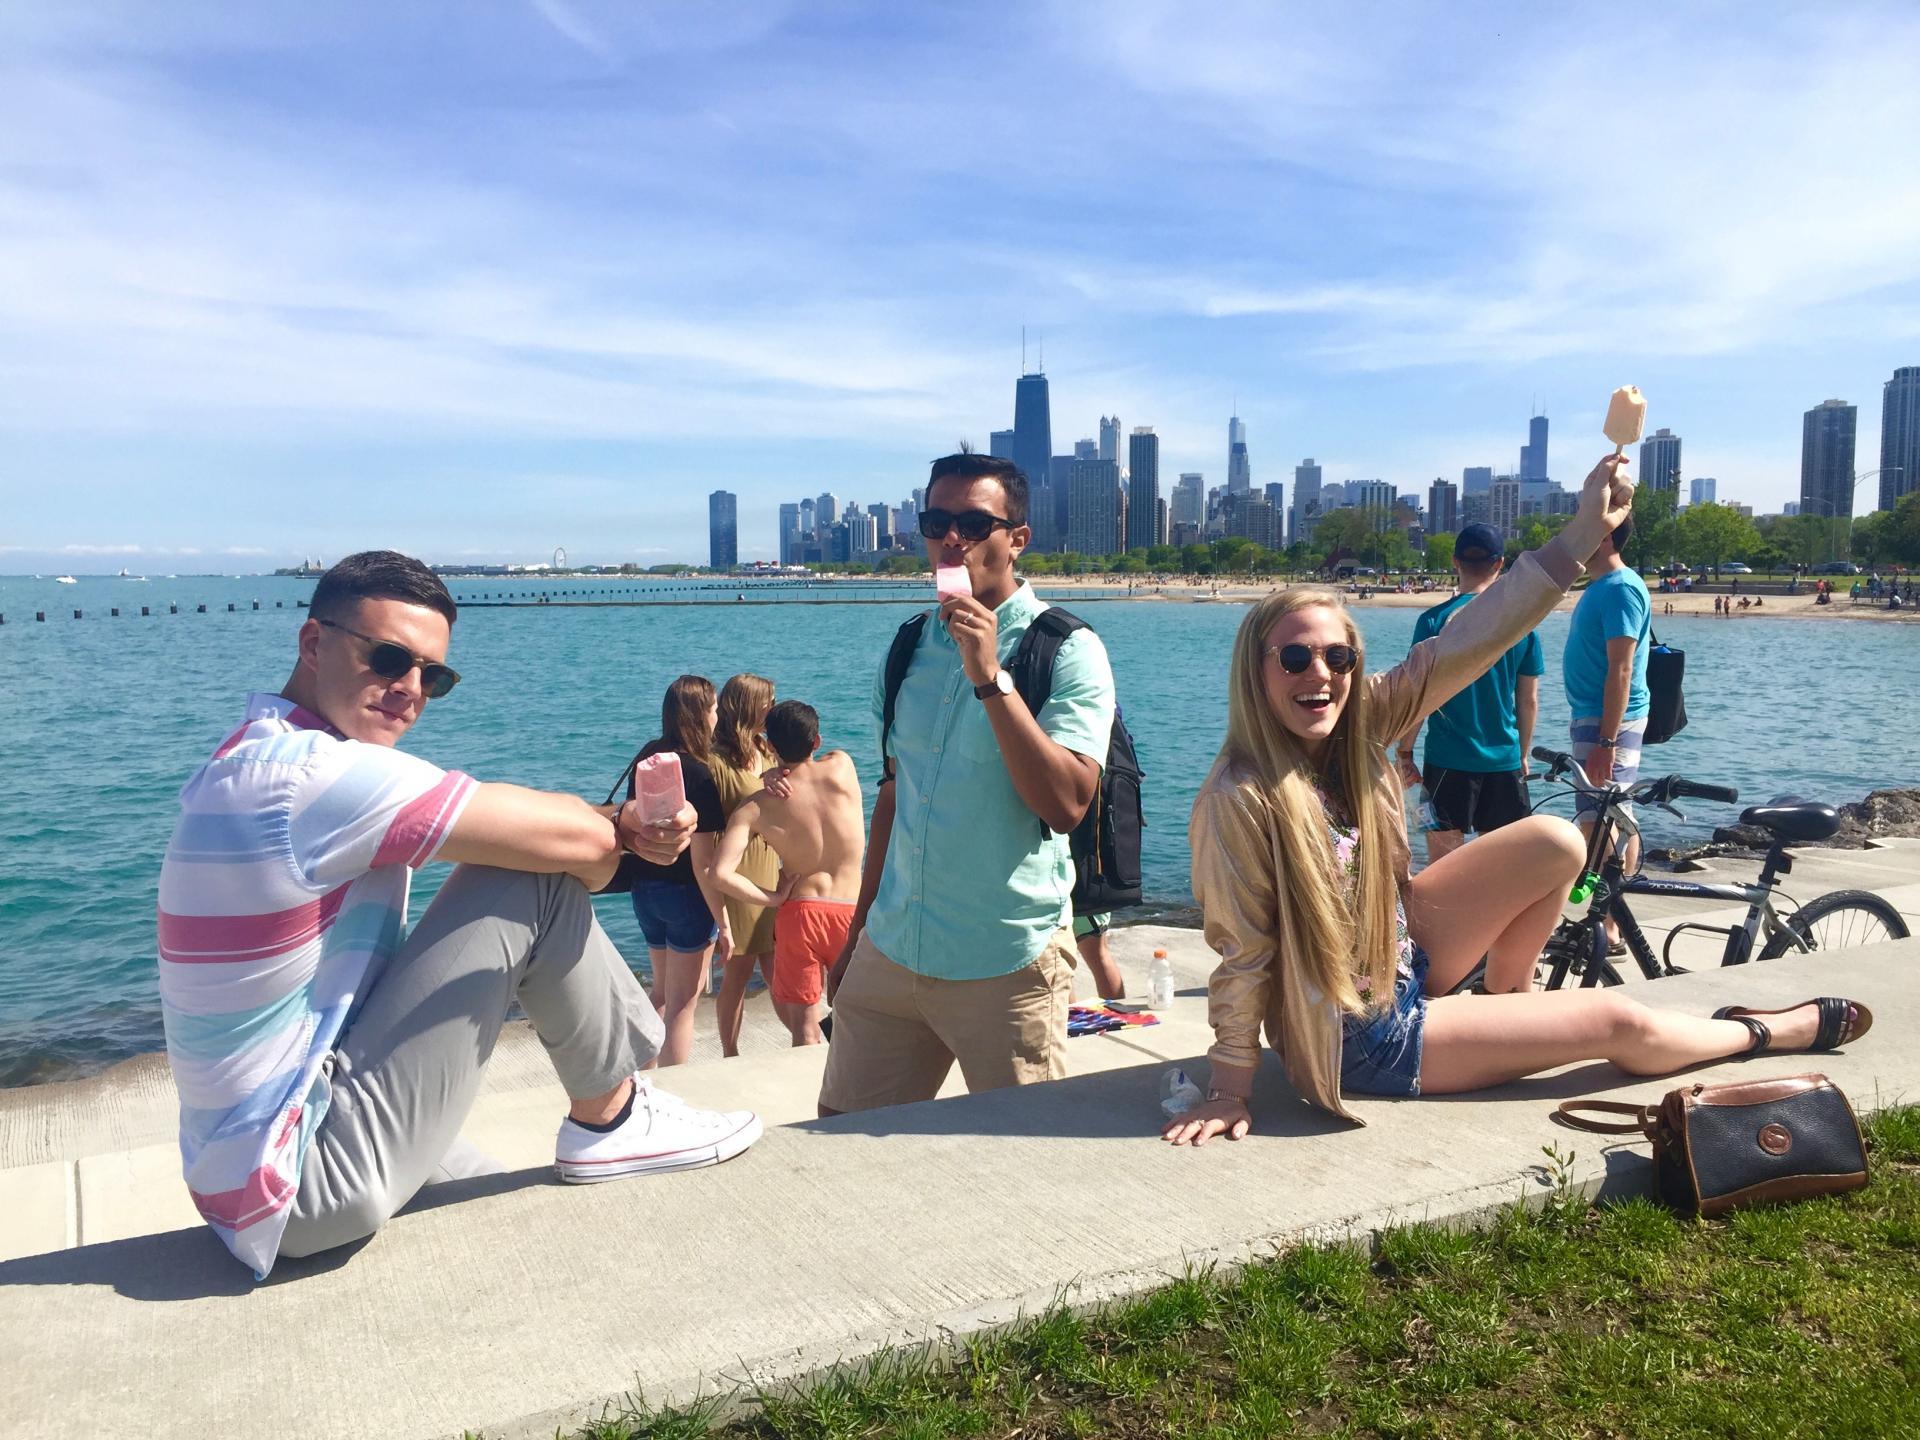 summertime in Chicago